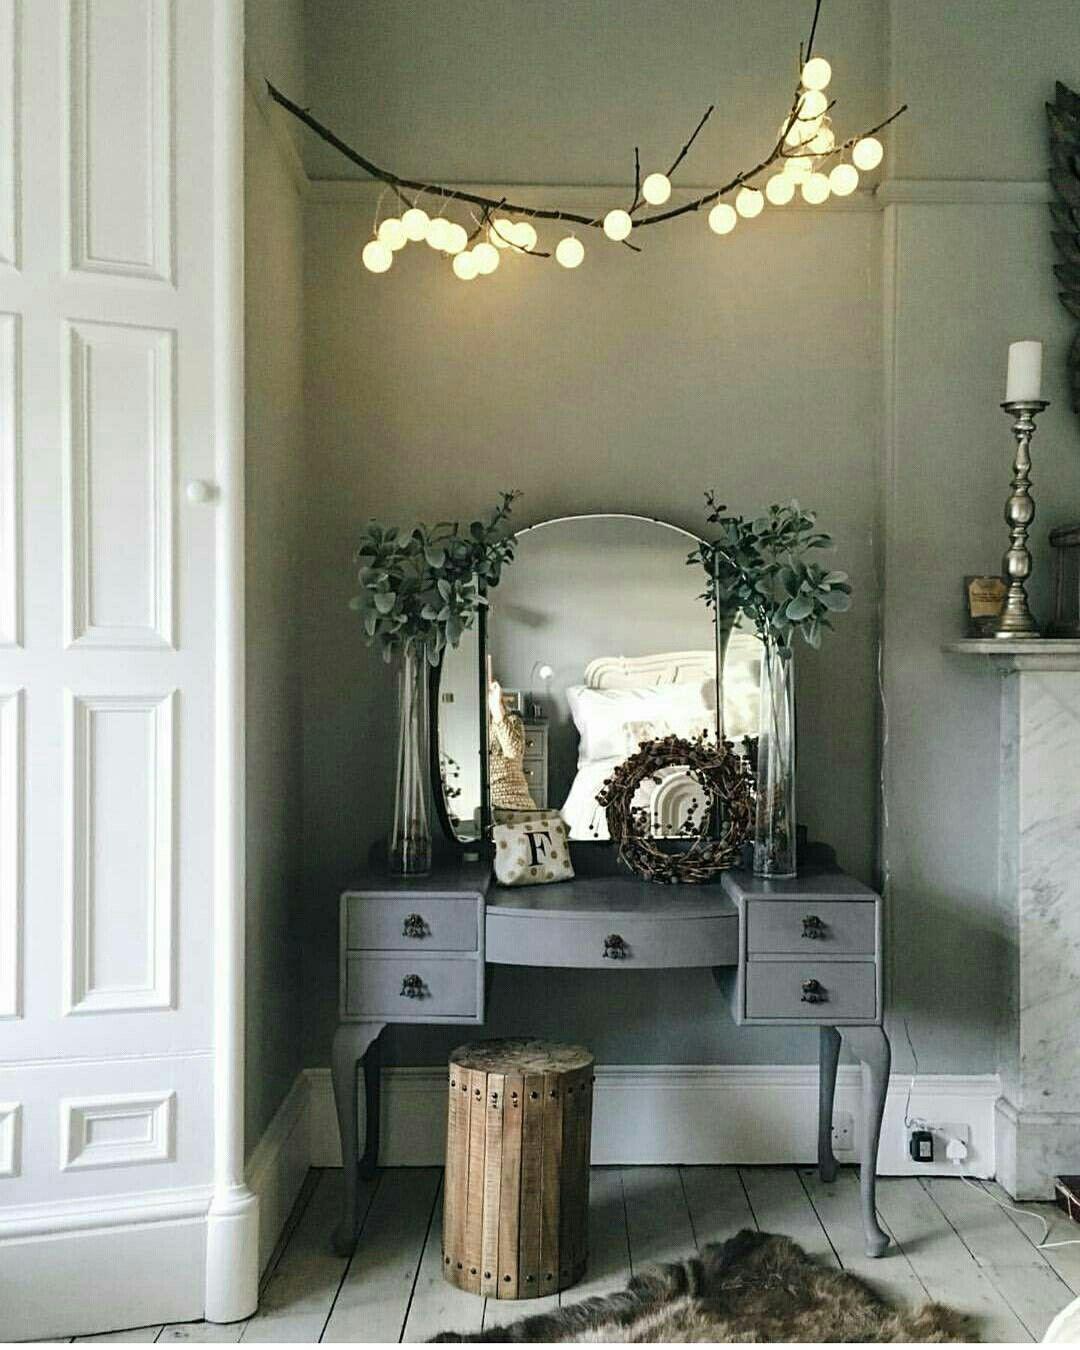 avana_design on insta love the lights on the branch